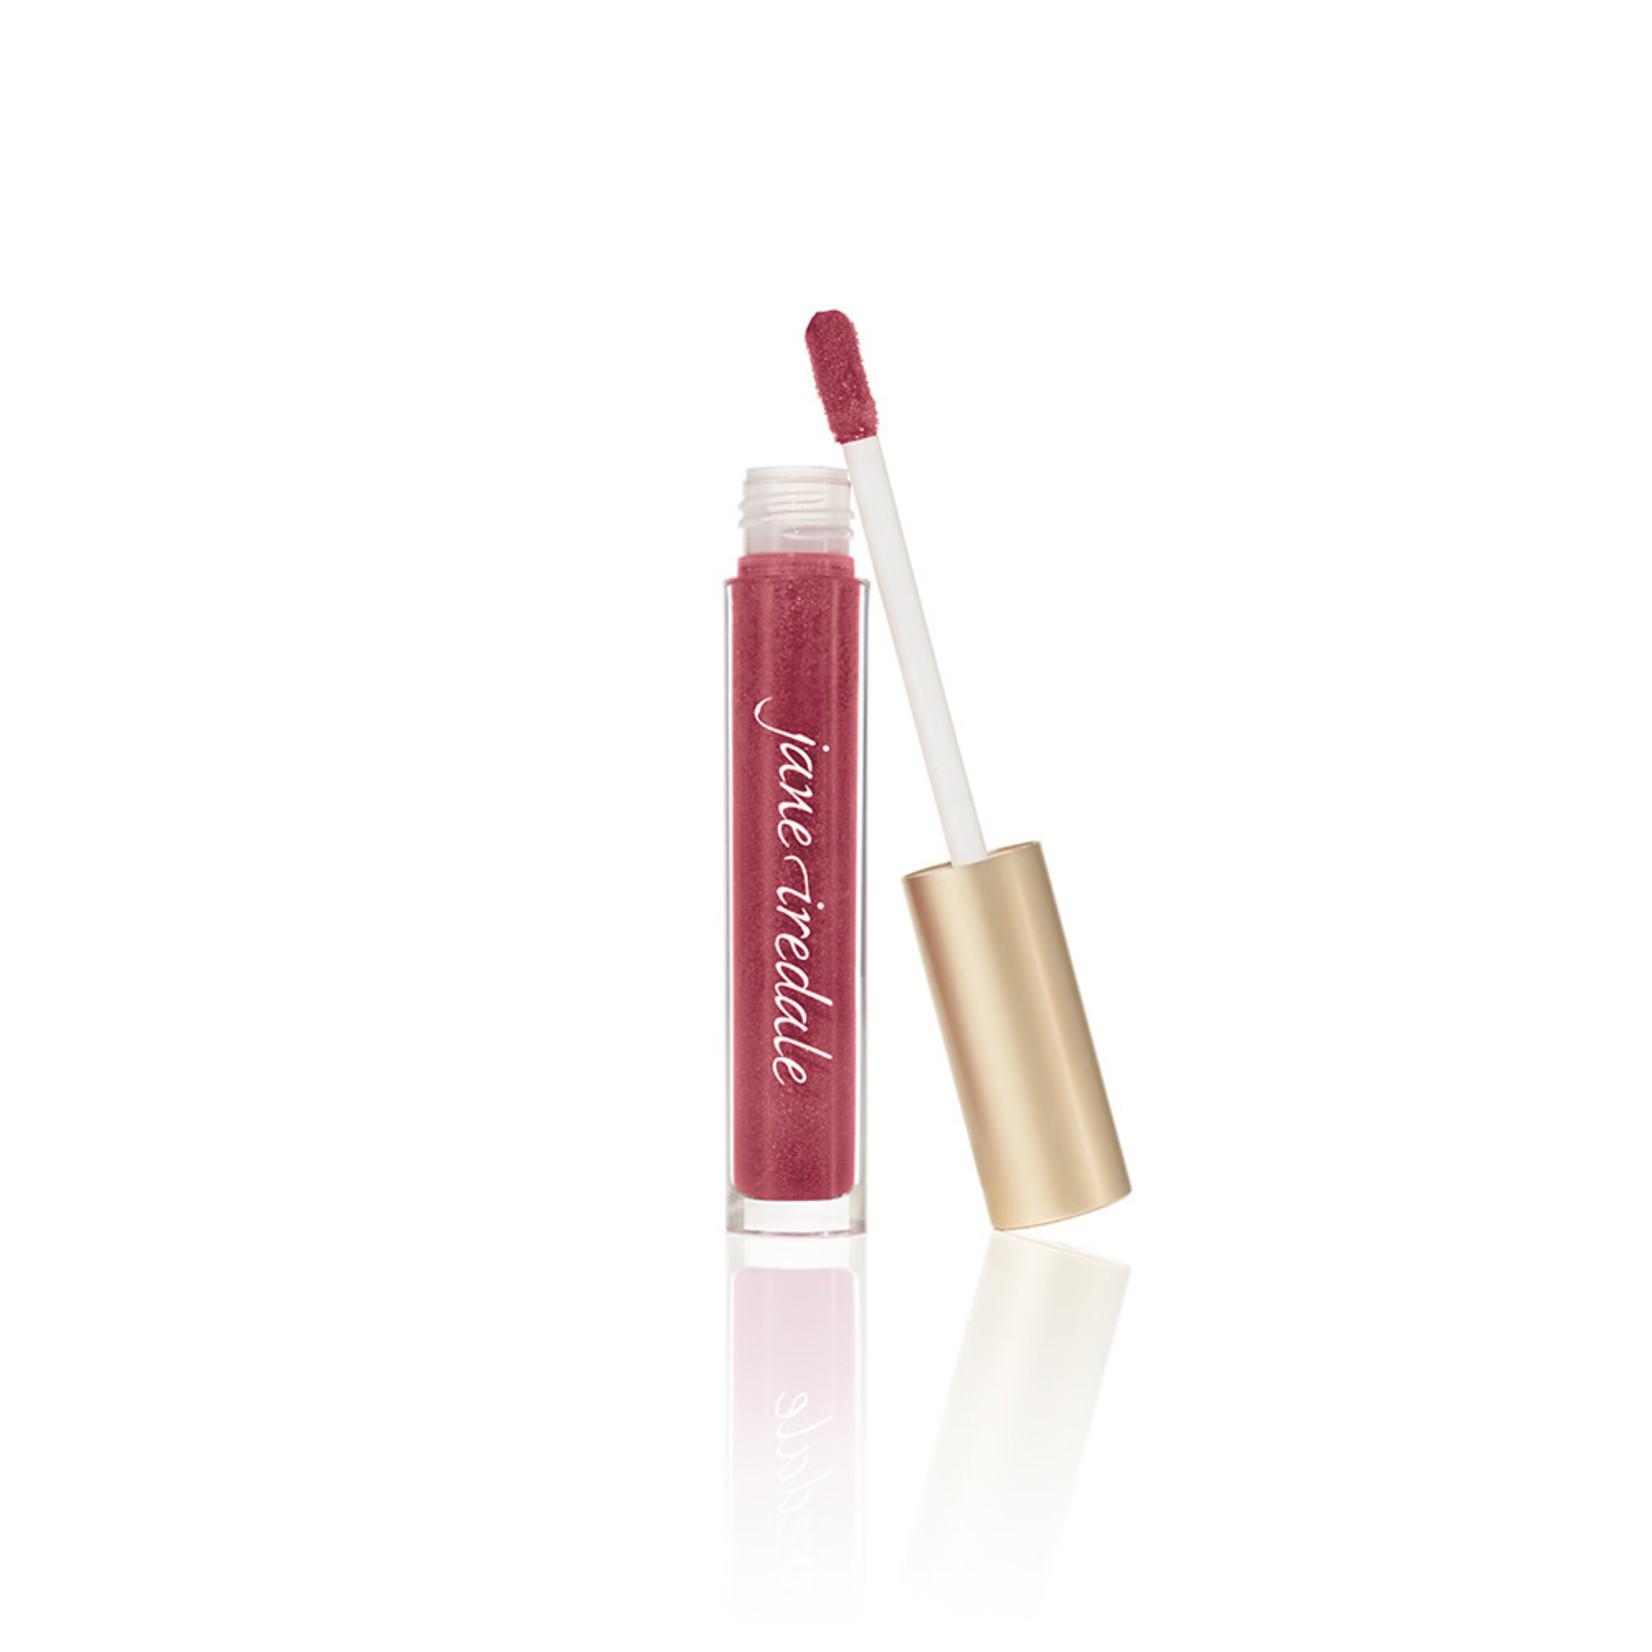 jane iredale Hyaluronic lip gloss - cosmo